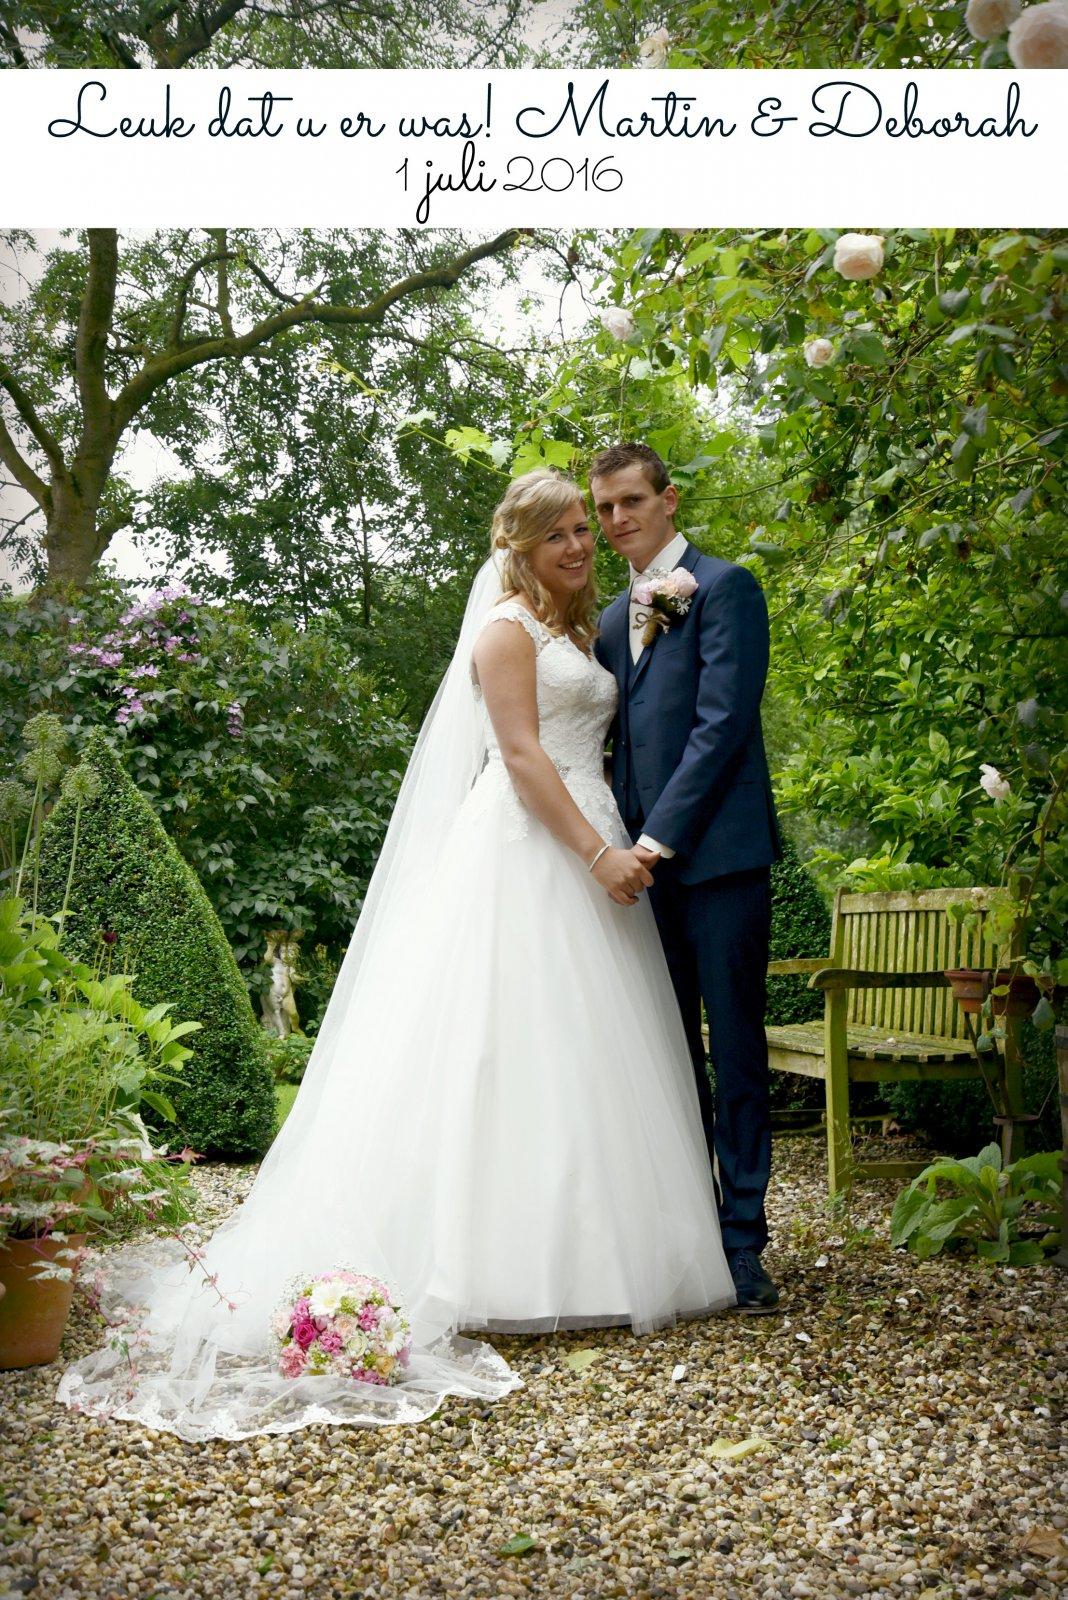 Bruidspaar Martin & Deborah (01-7-2016)